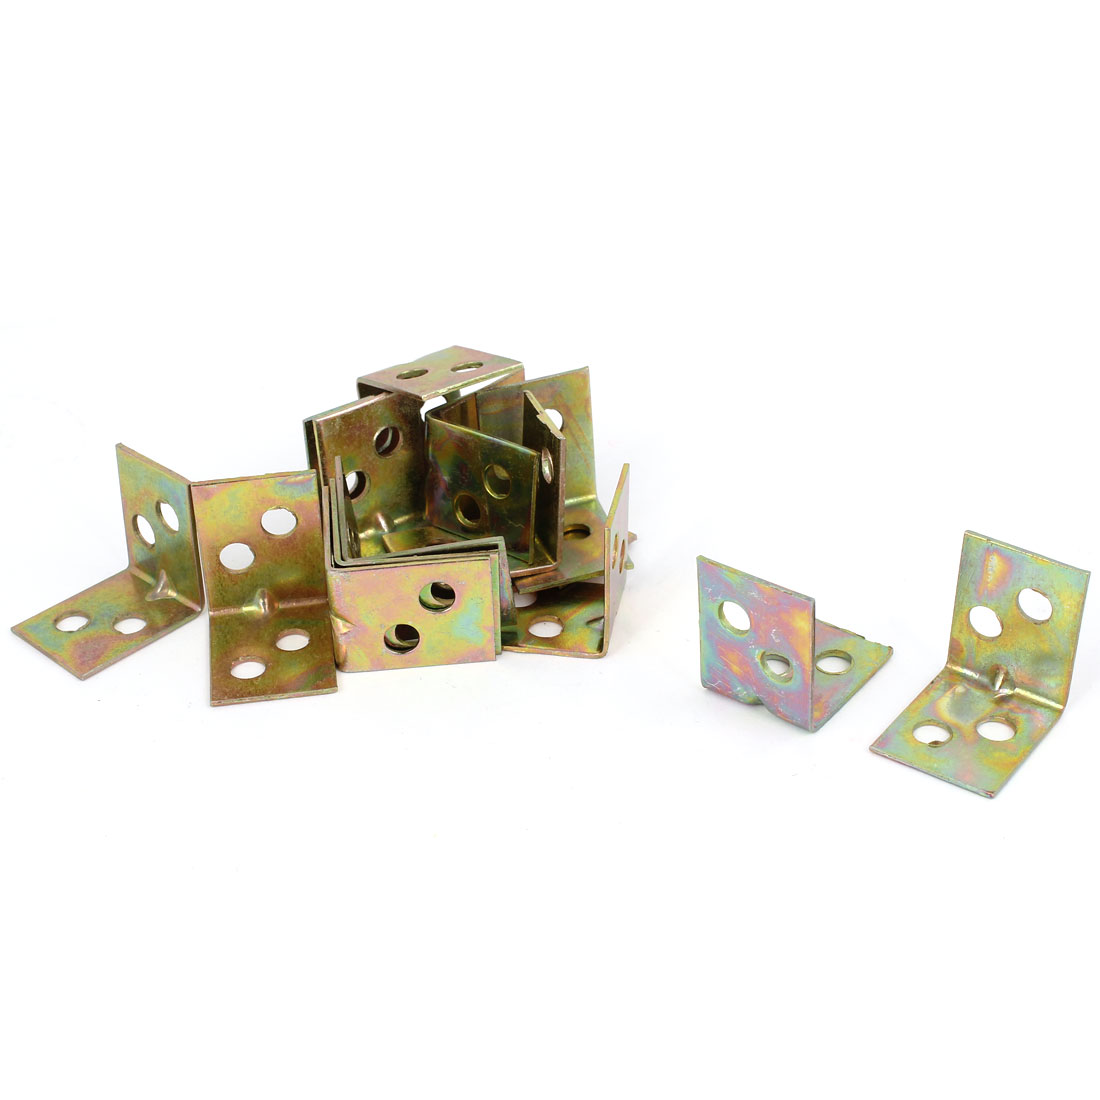 Shelf Door 20mm x 20mm 90 Degree Corner Angle Brackets Bronze Tone 15 Pcs